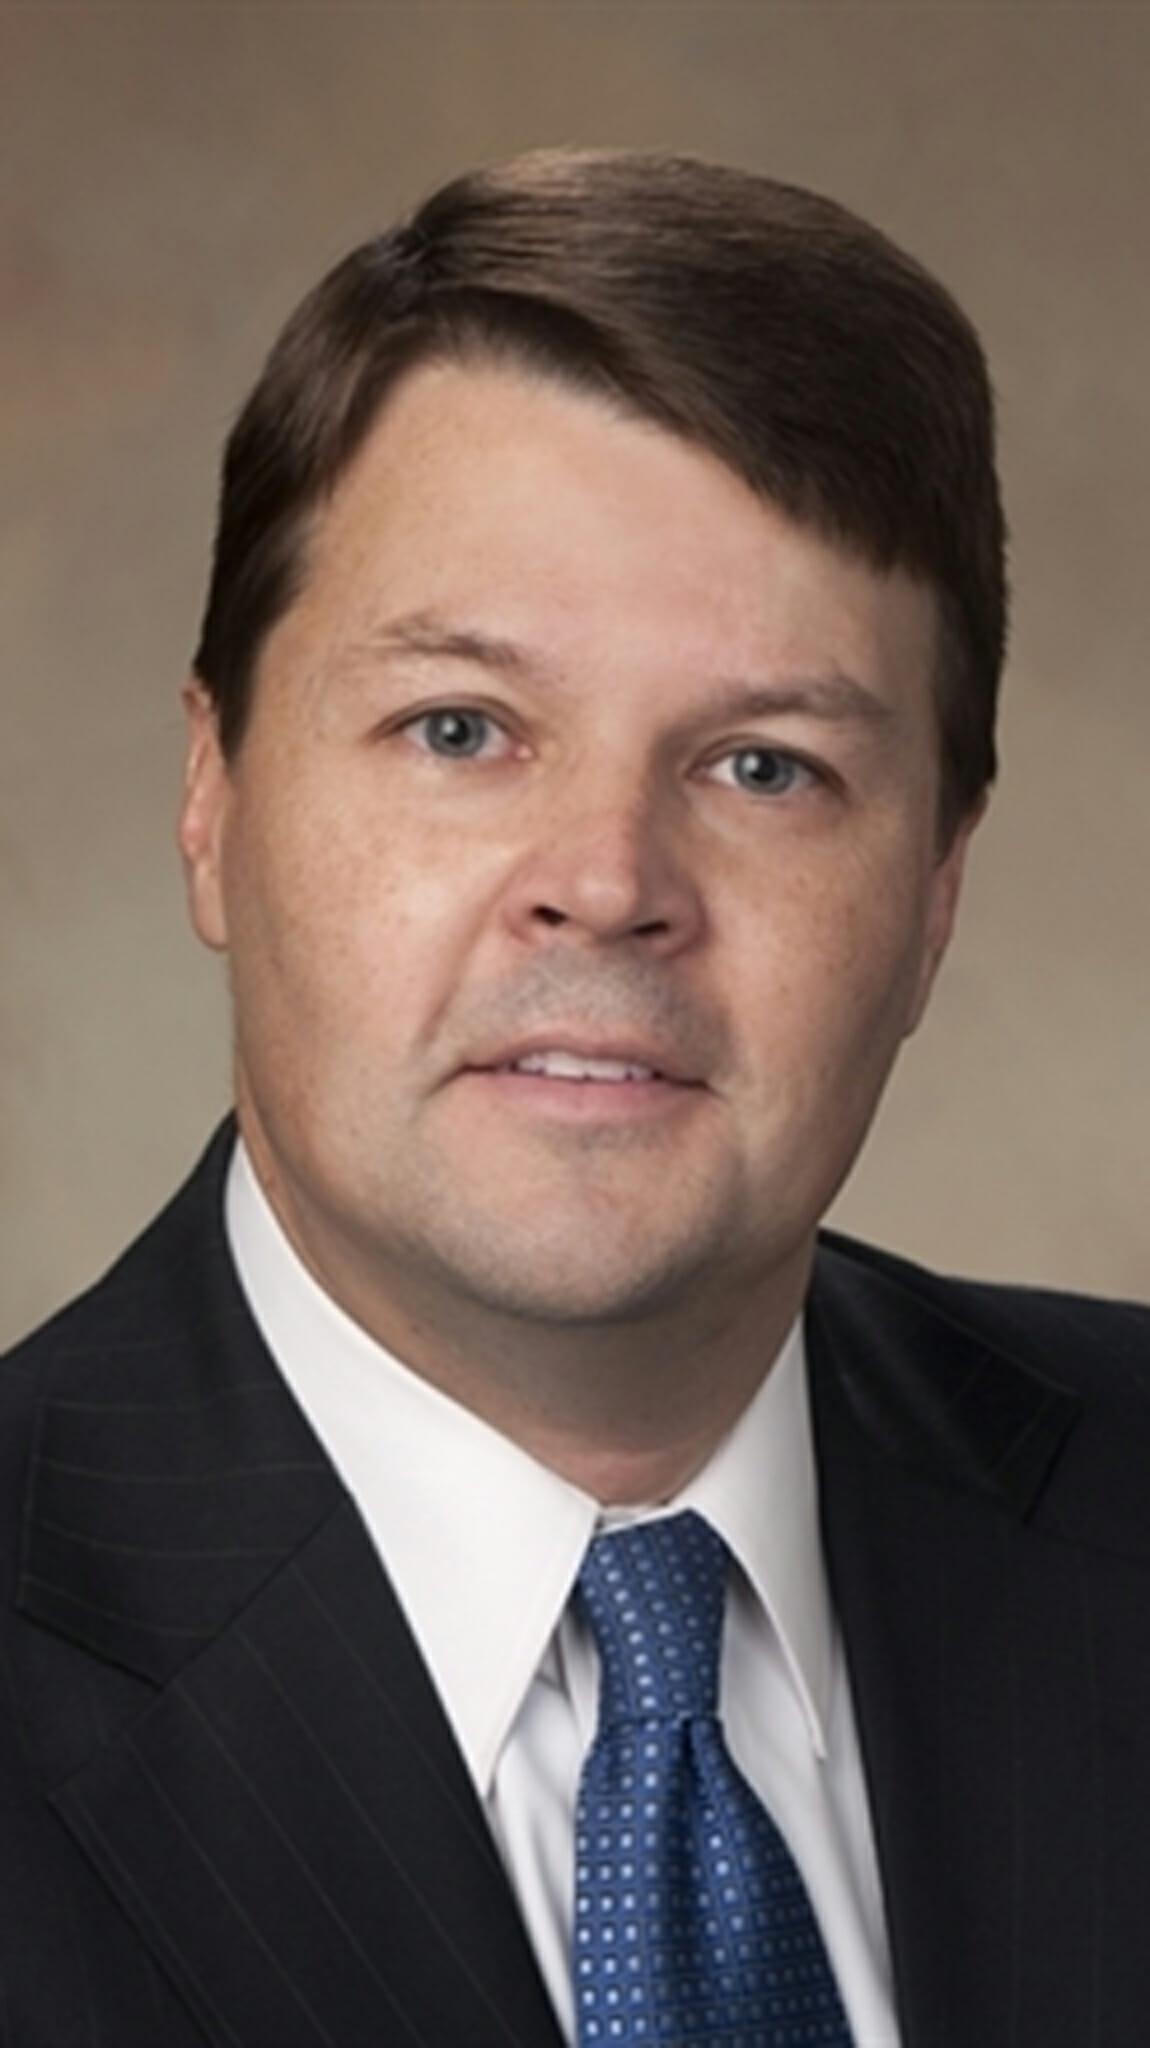 Cliff Johnson